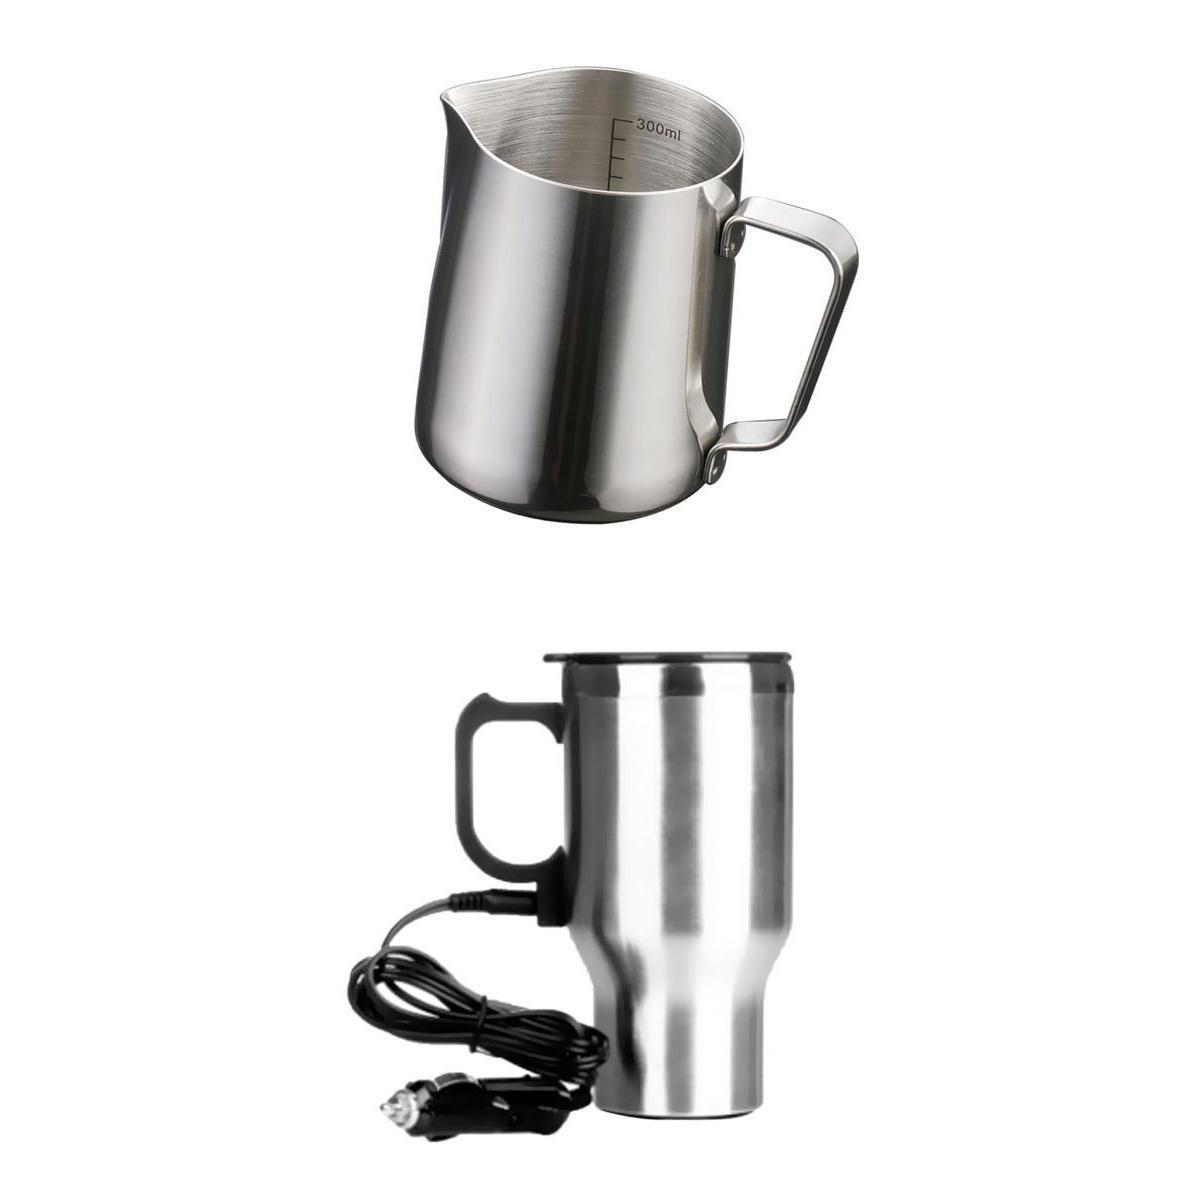 Travel Mug Deals At Line On Cheap 450ml 450mlFind g6vYIb7yf